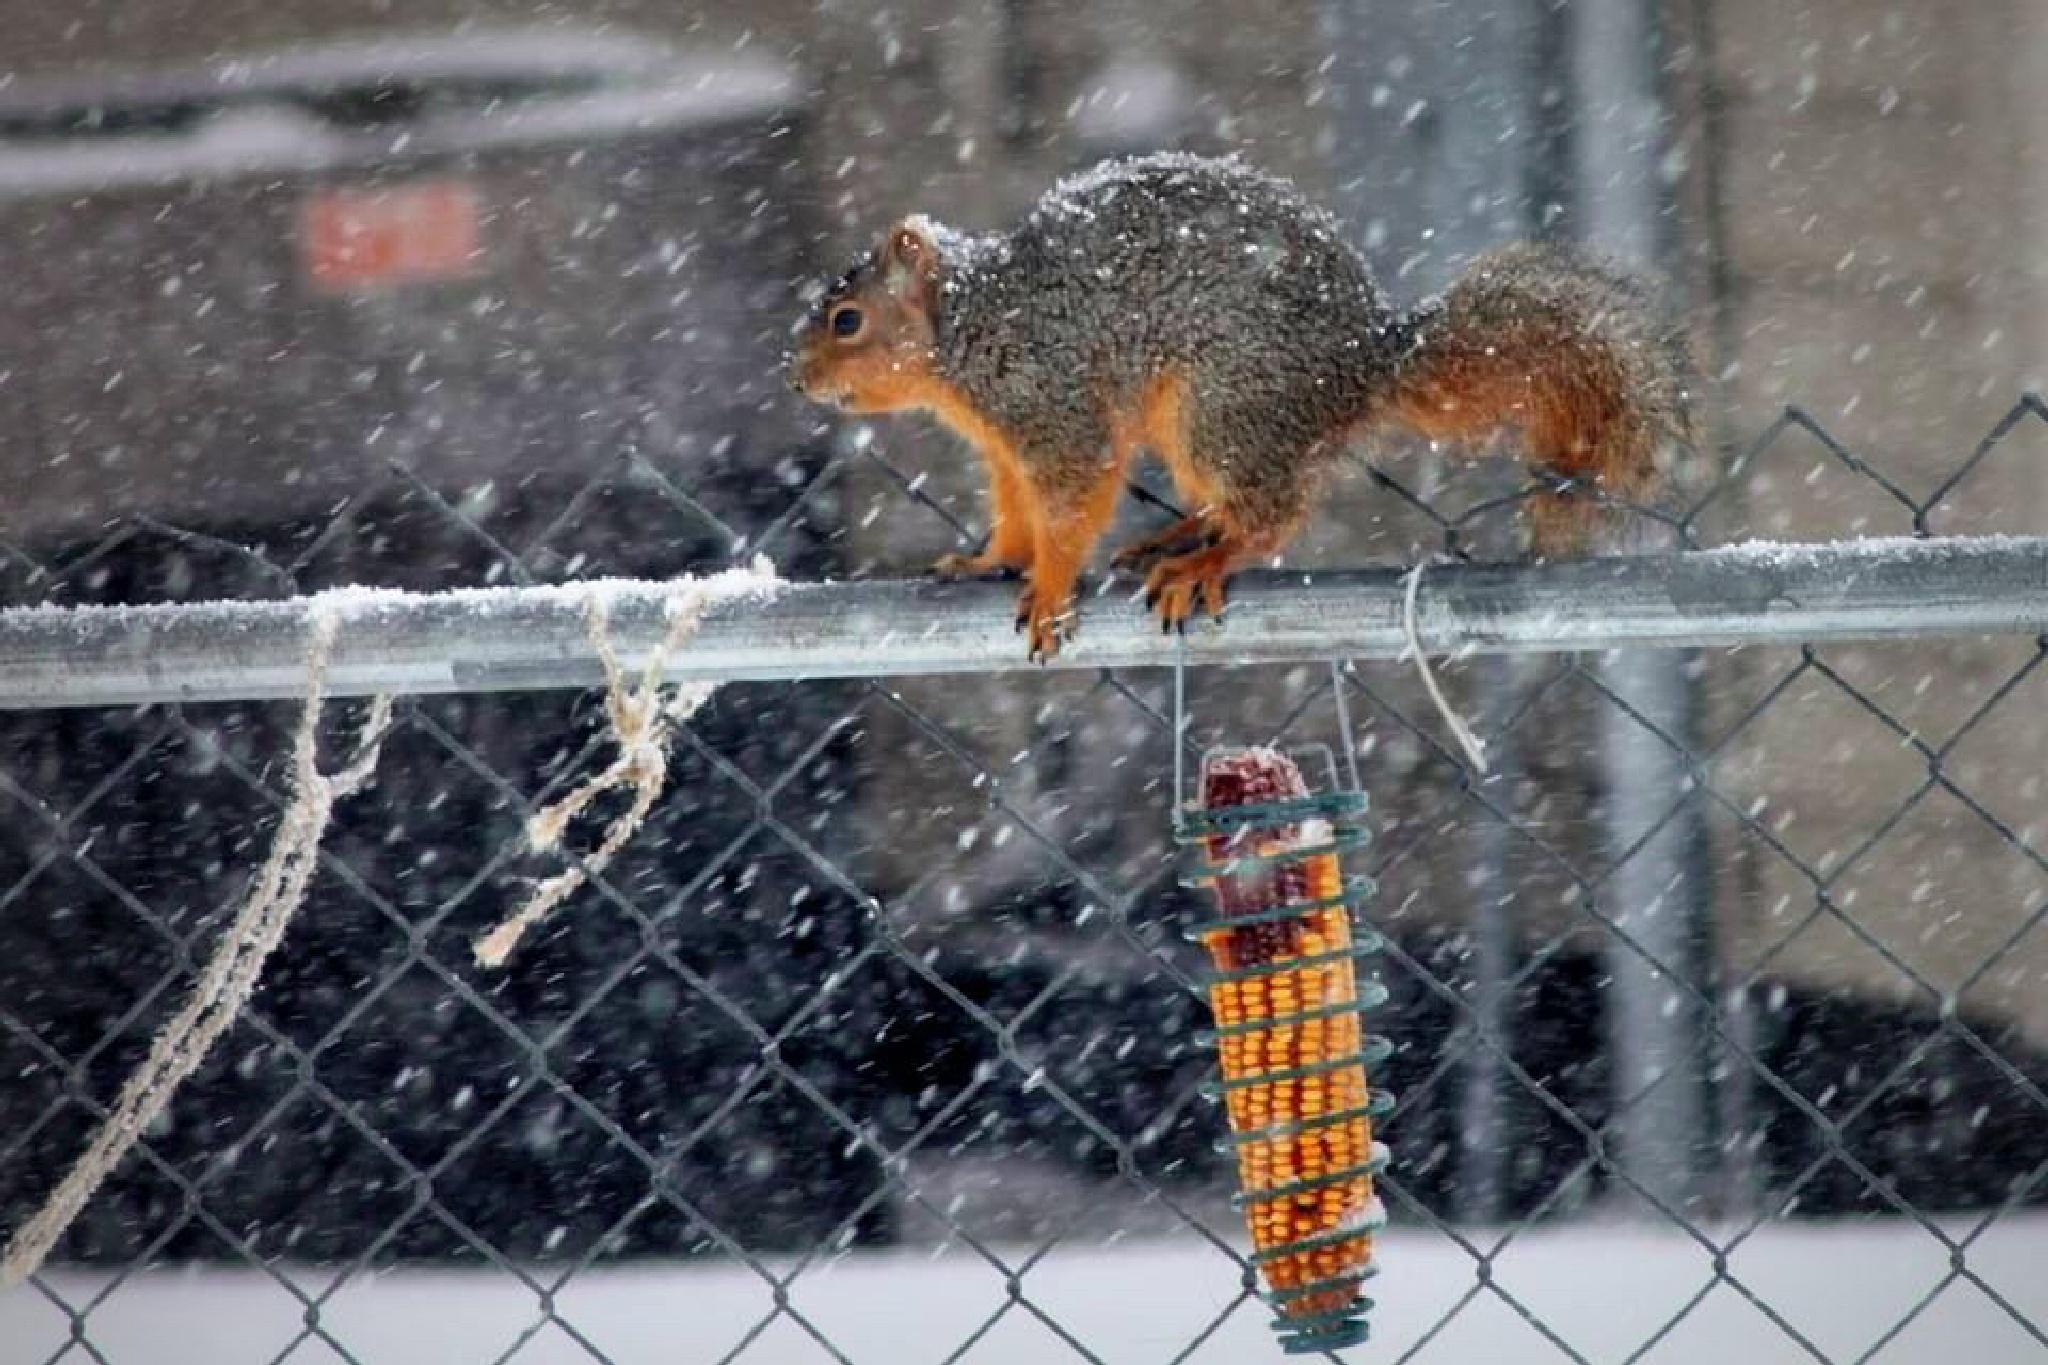 Winter corn by Mark Hootman